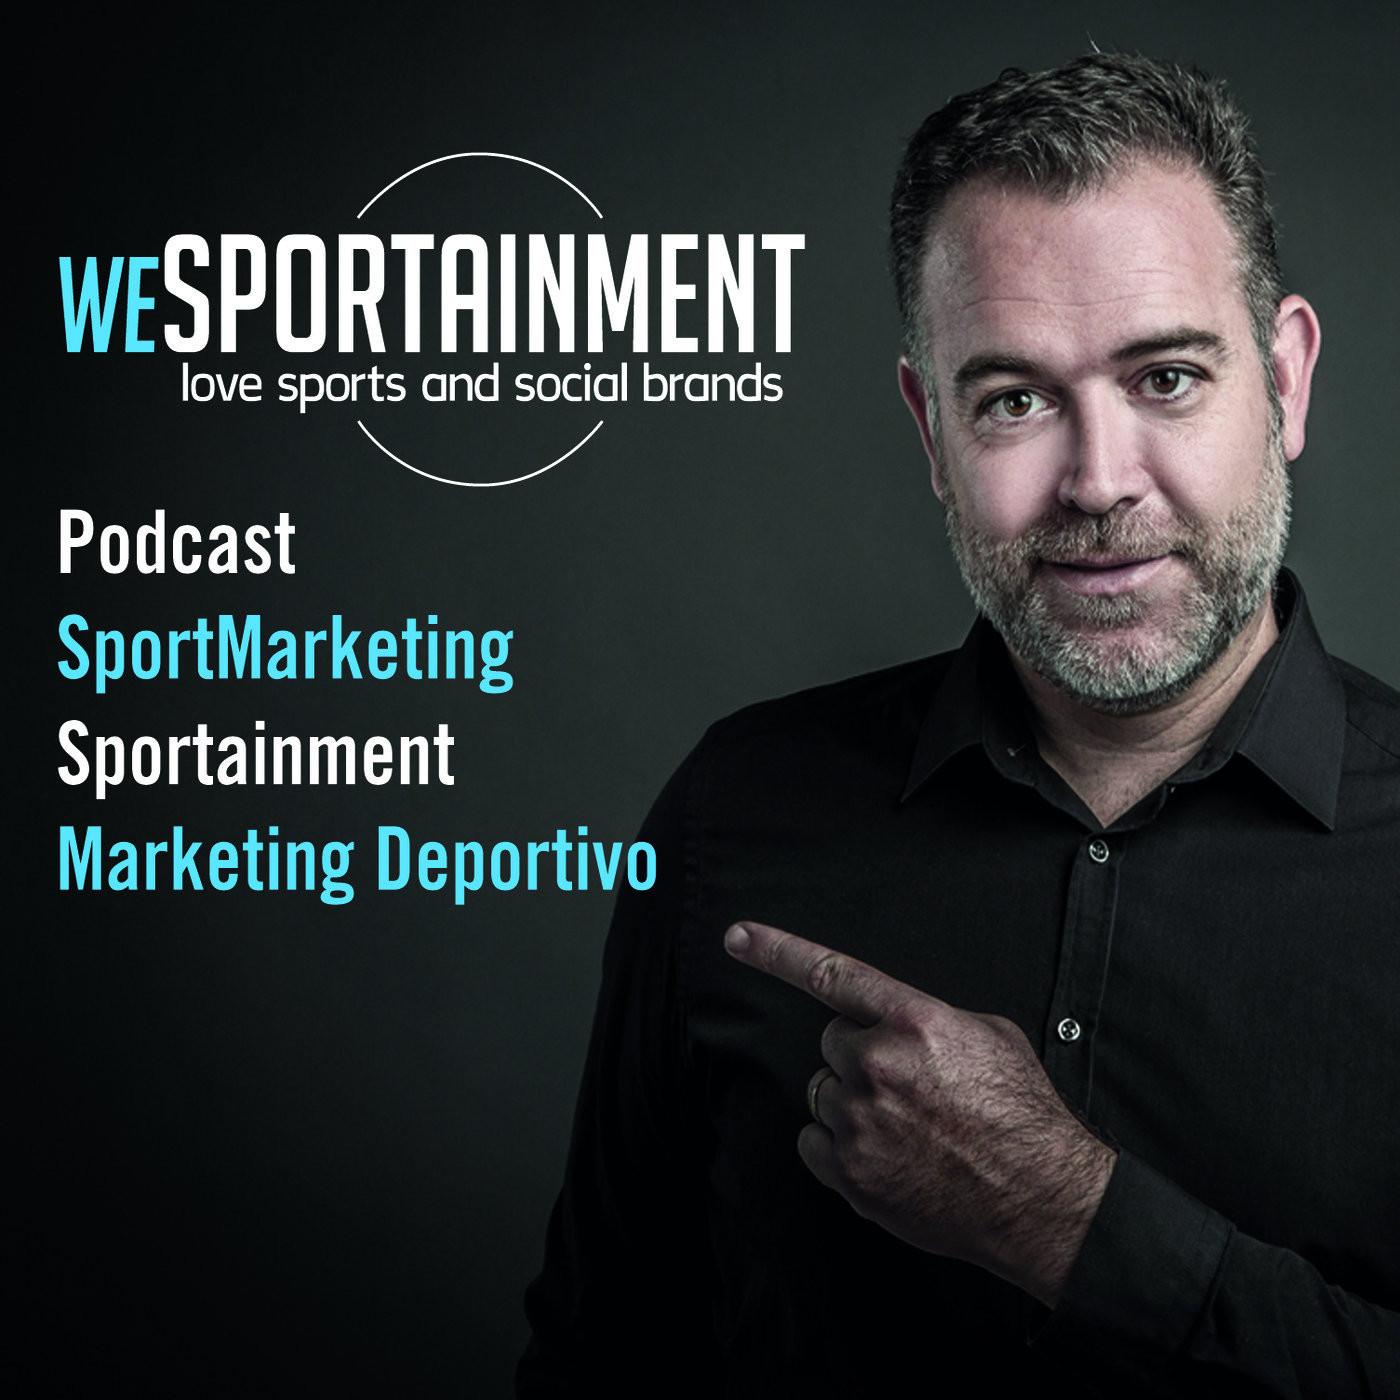 <![CDATA[WeSportainment. Marketing deportivo, sportainment,]]>